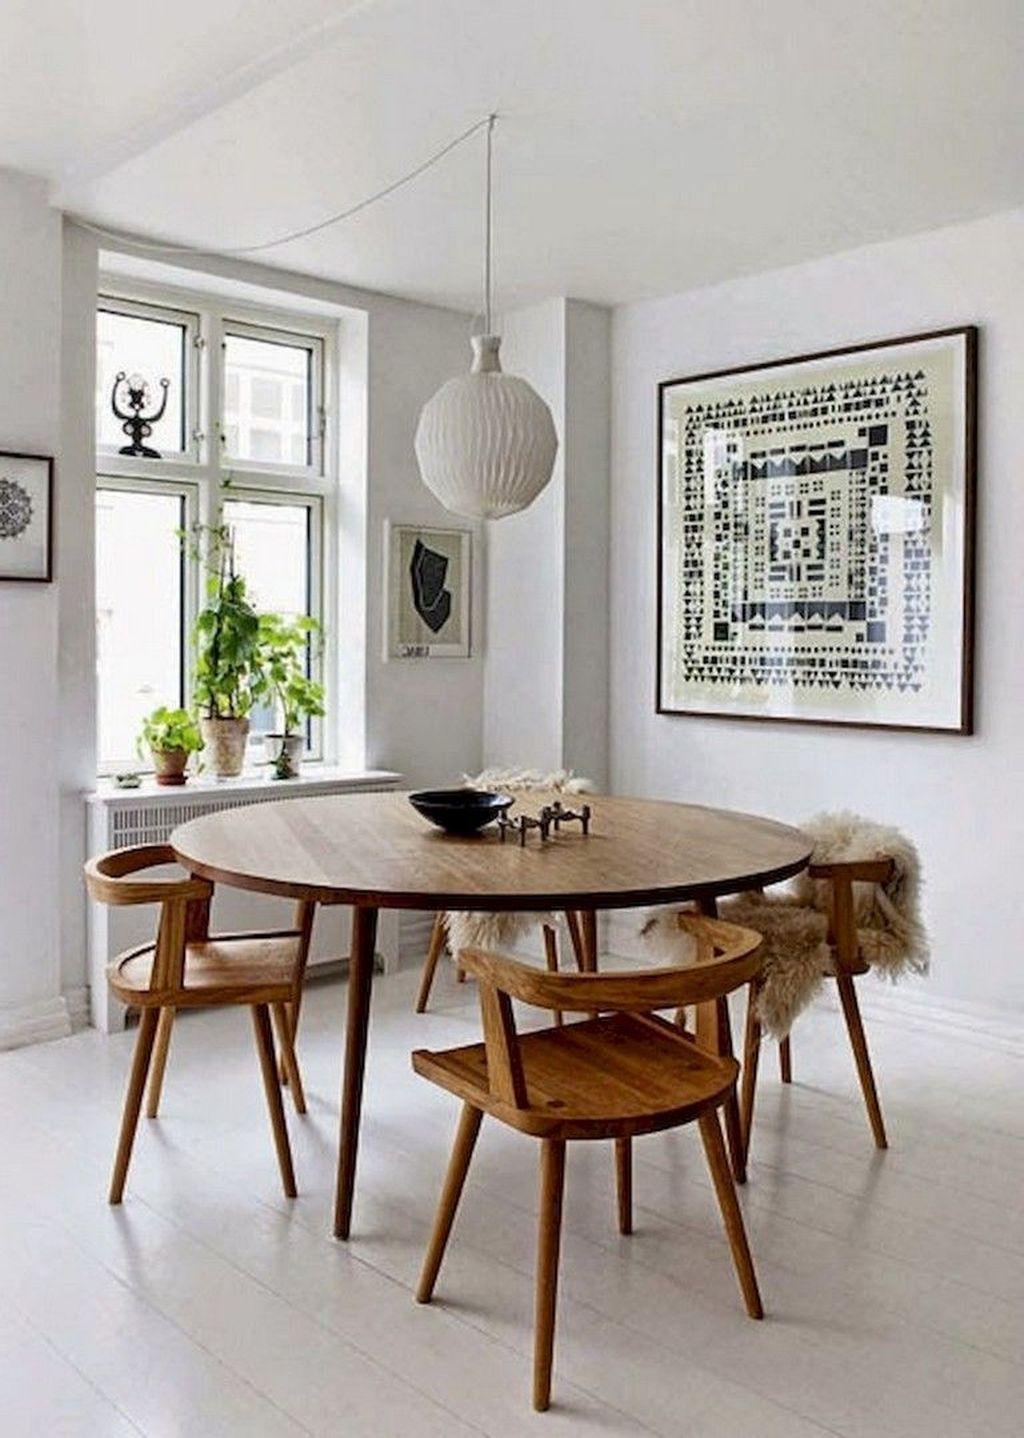 Pin By Mili Saini On Cycle Studio Ideas Dining Room Inspiration